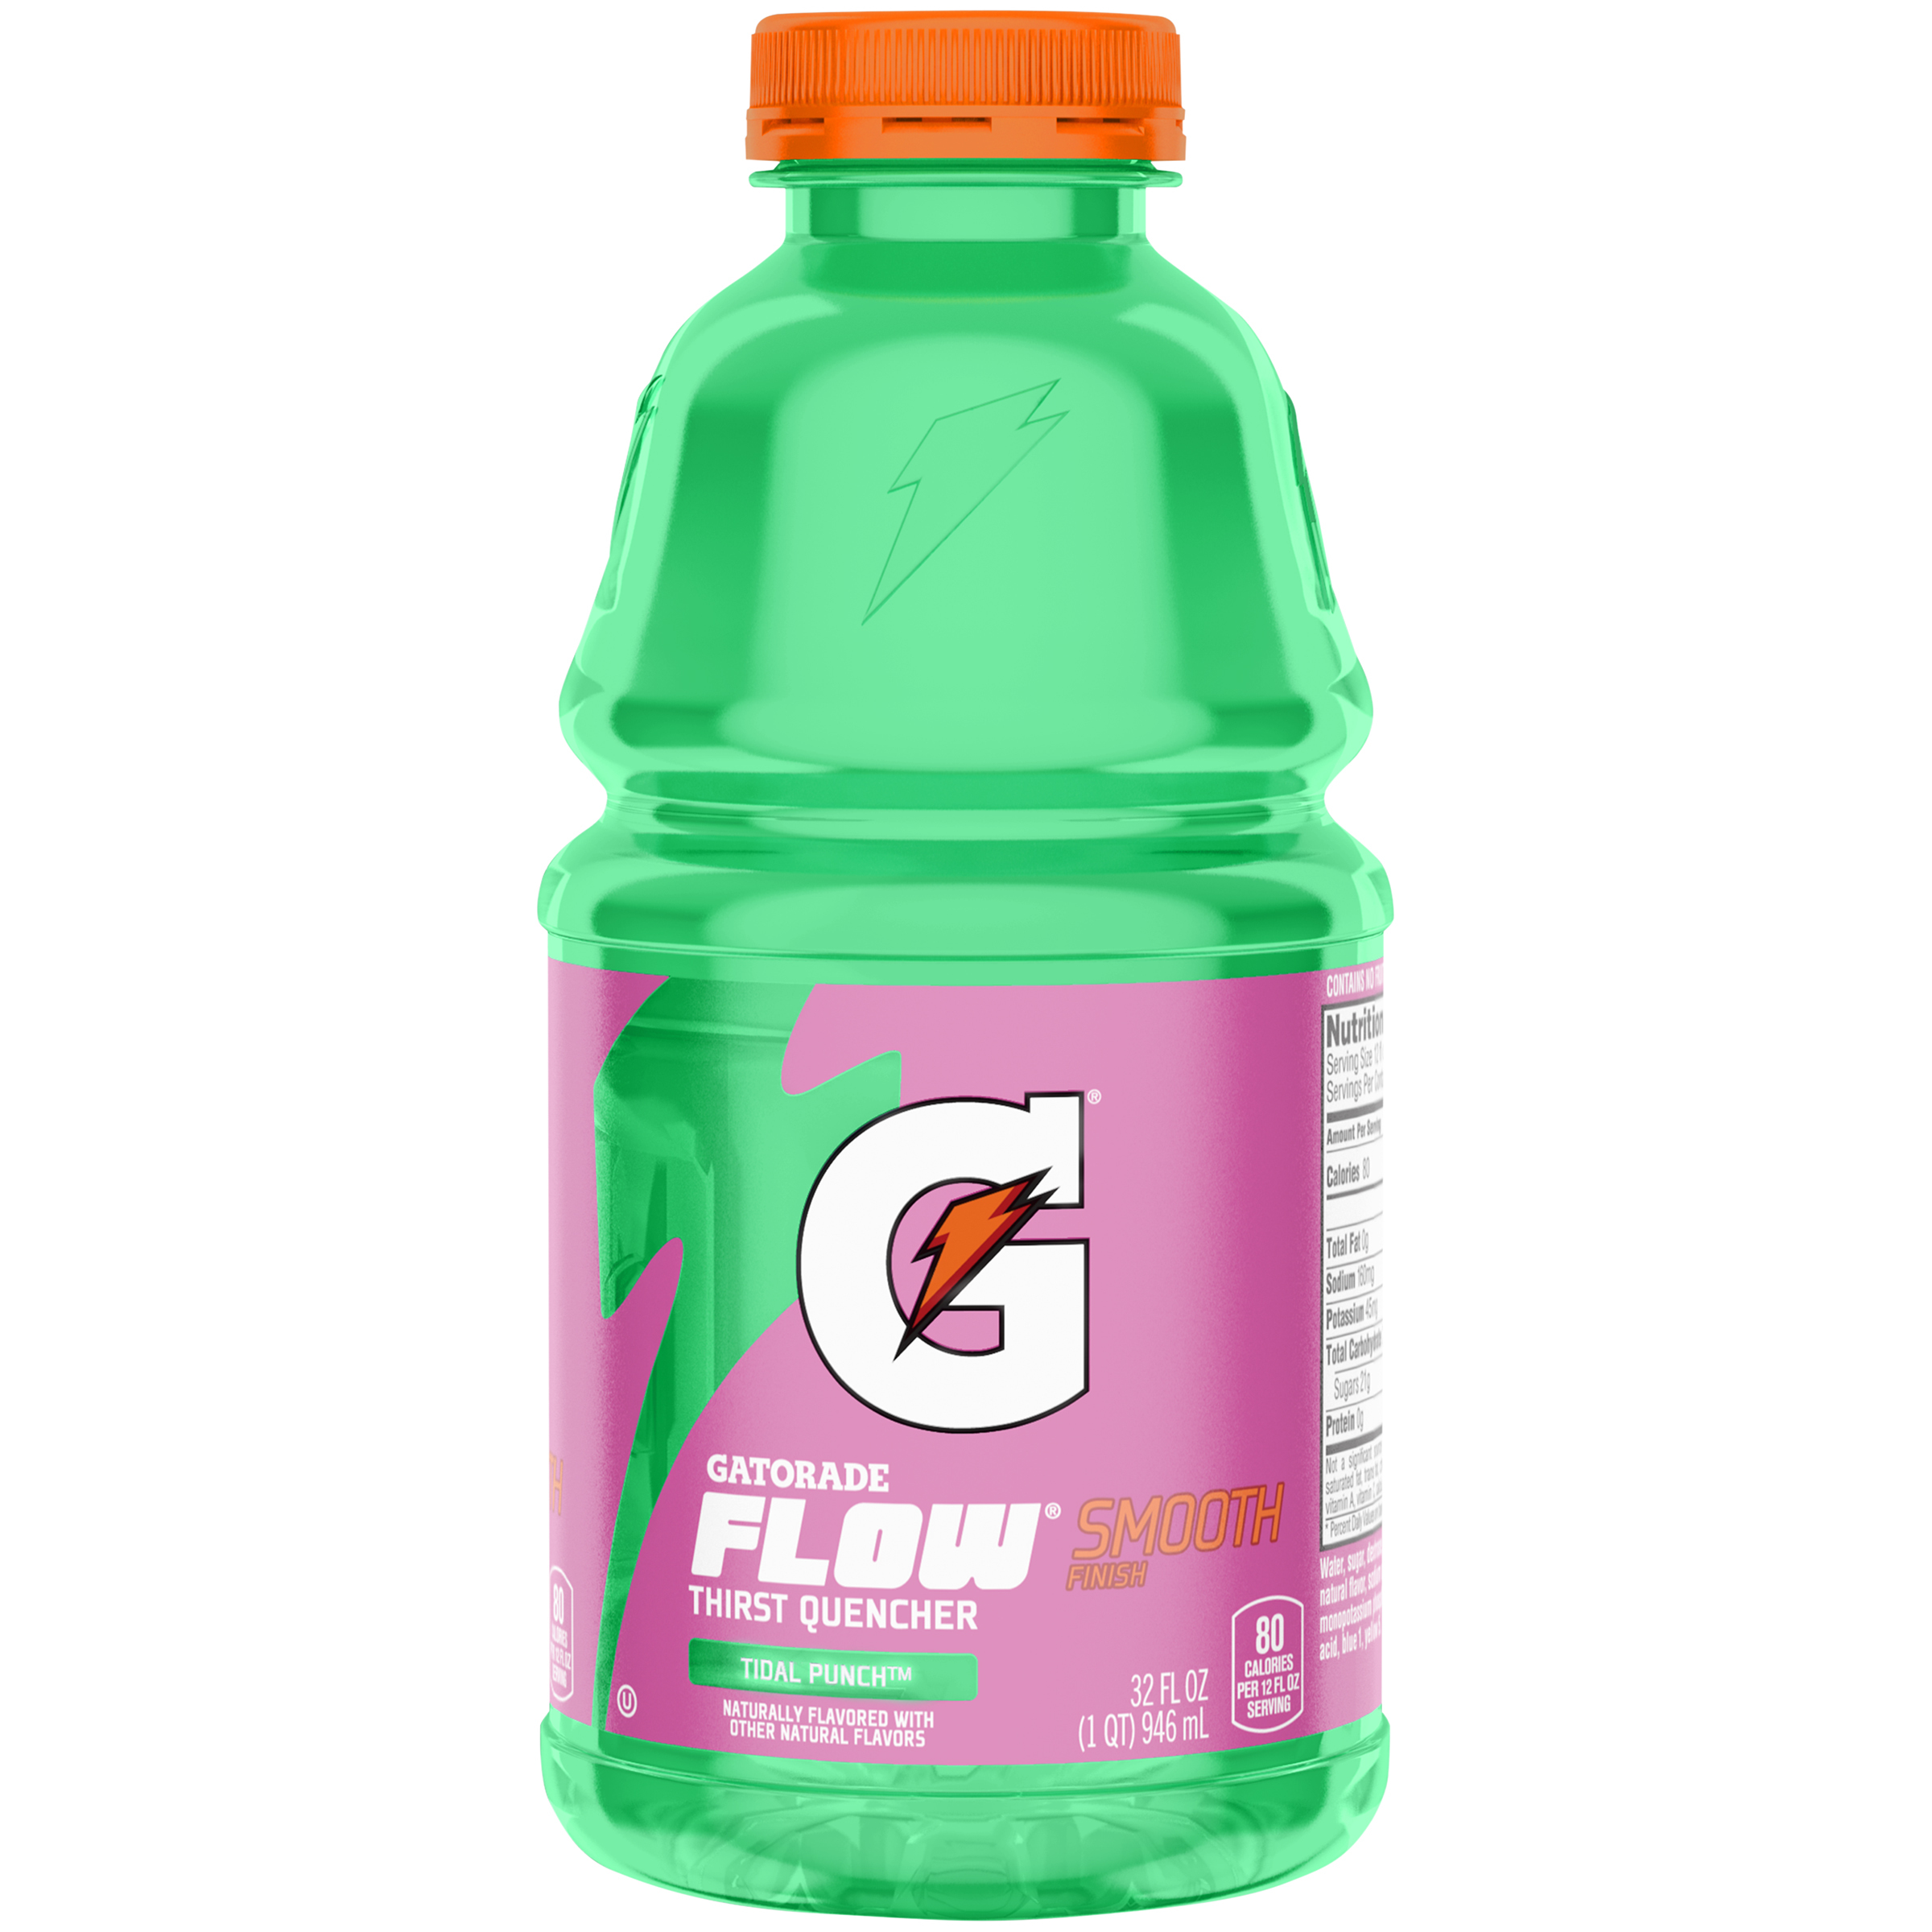 Gatorade Flow Smooth Finish Tidal Punch Thirst Quencher 32 fl. oz. Bottle